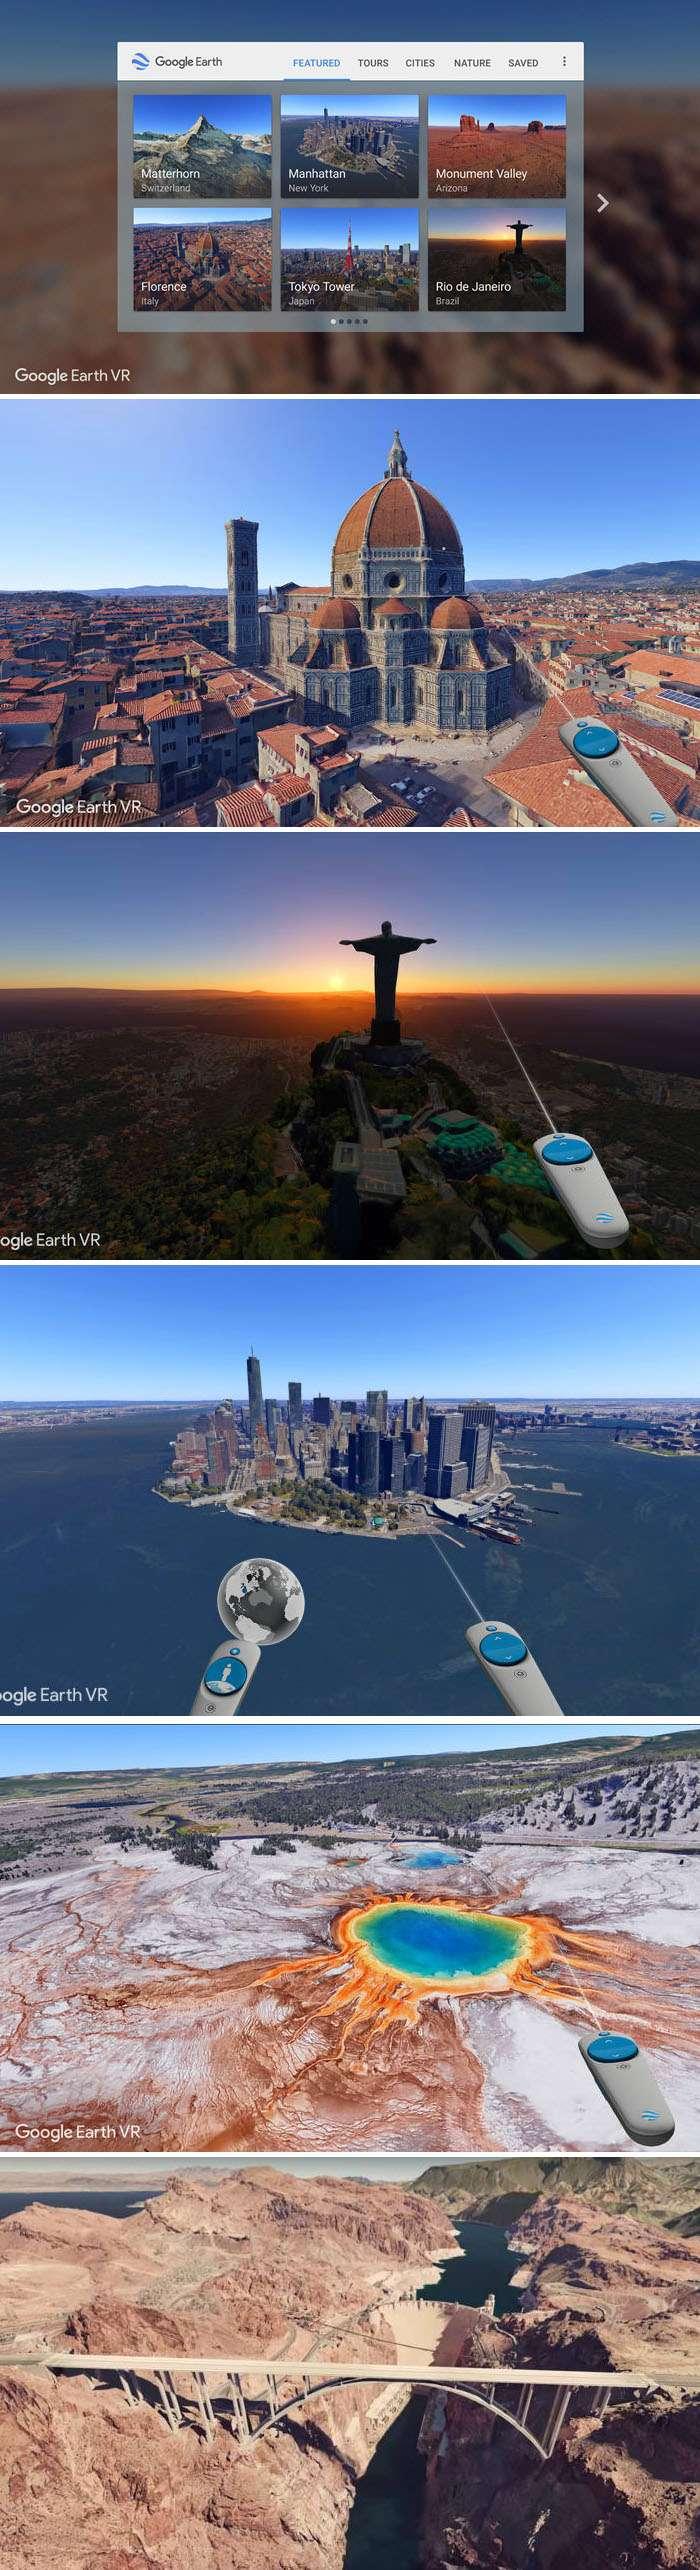 Google Earth VR - Voe sobre o mundo todo com a realidade virtual stylo urbano